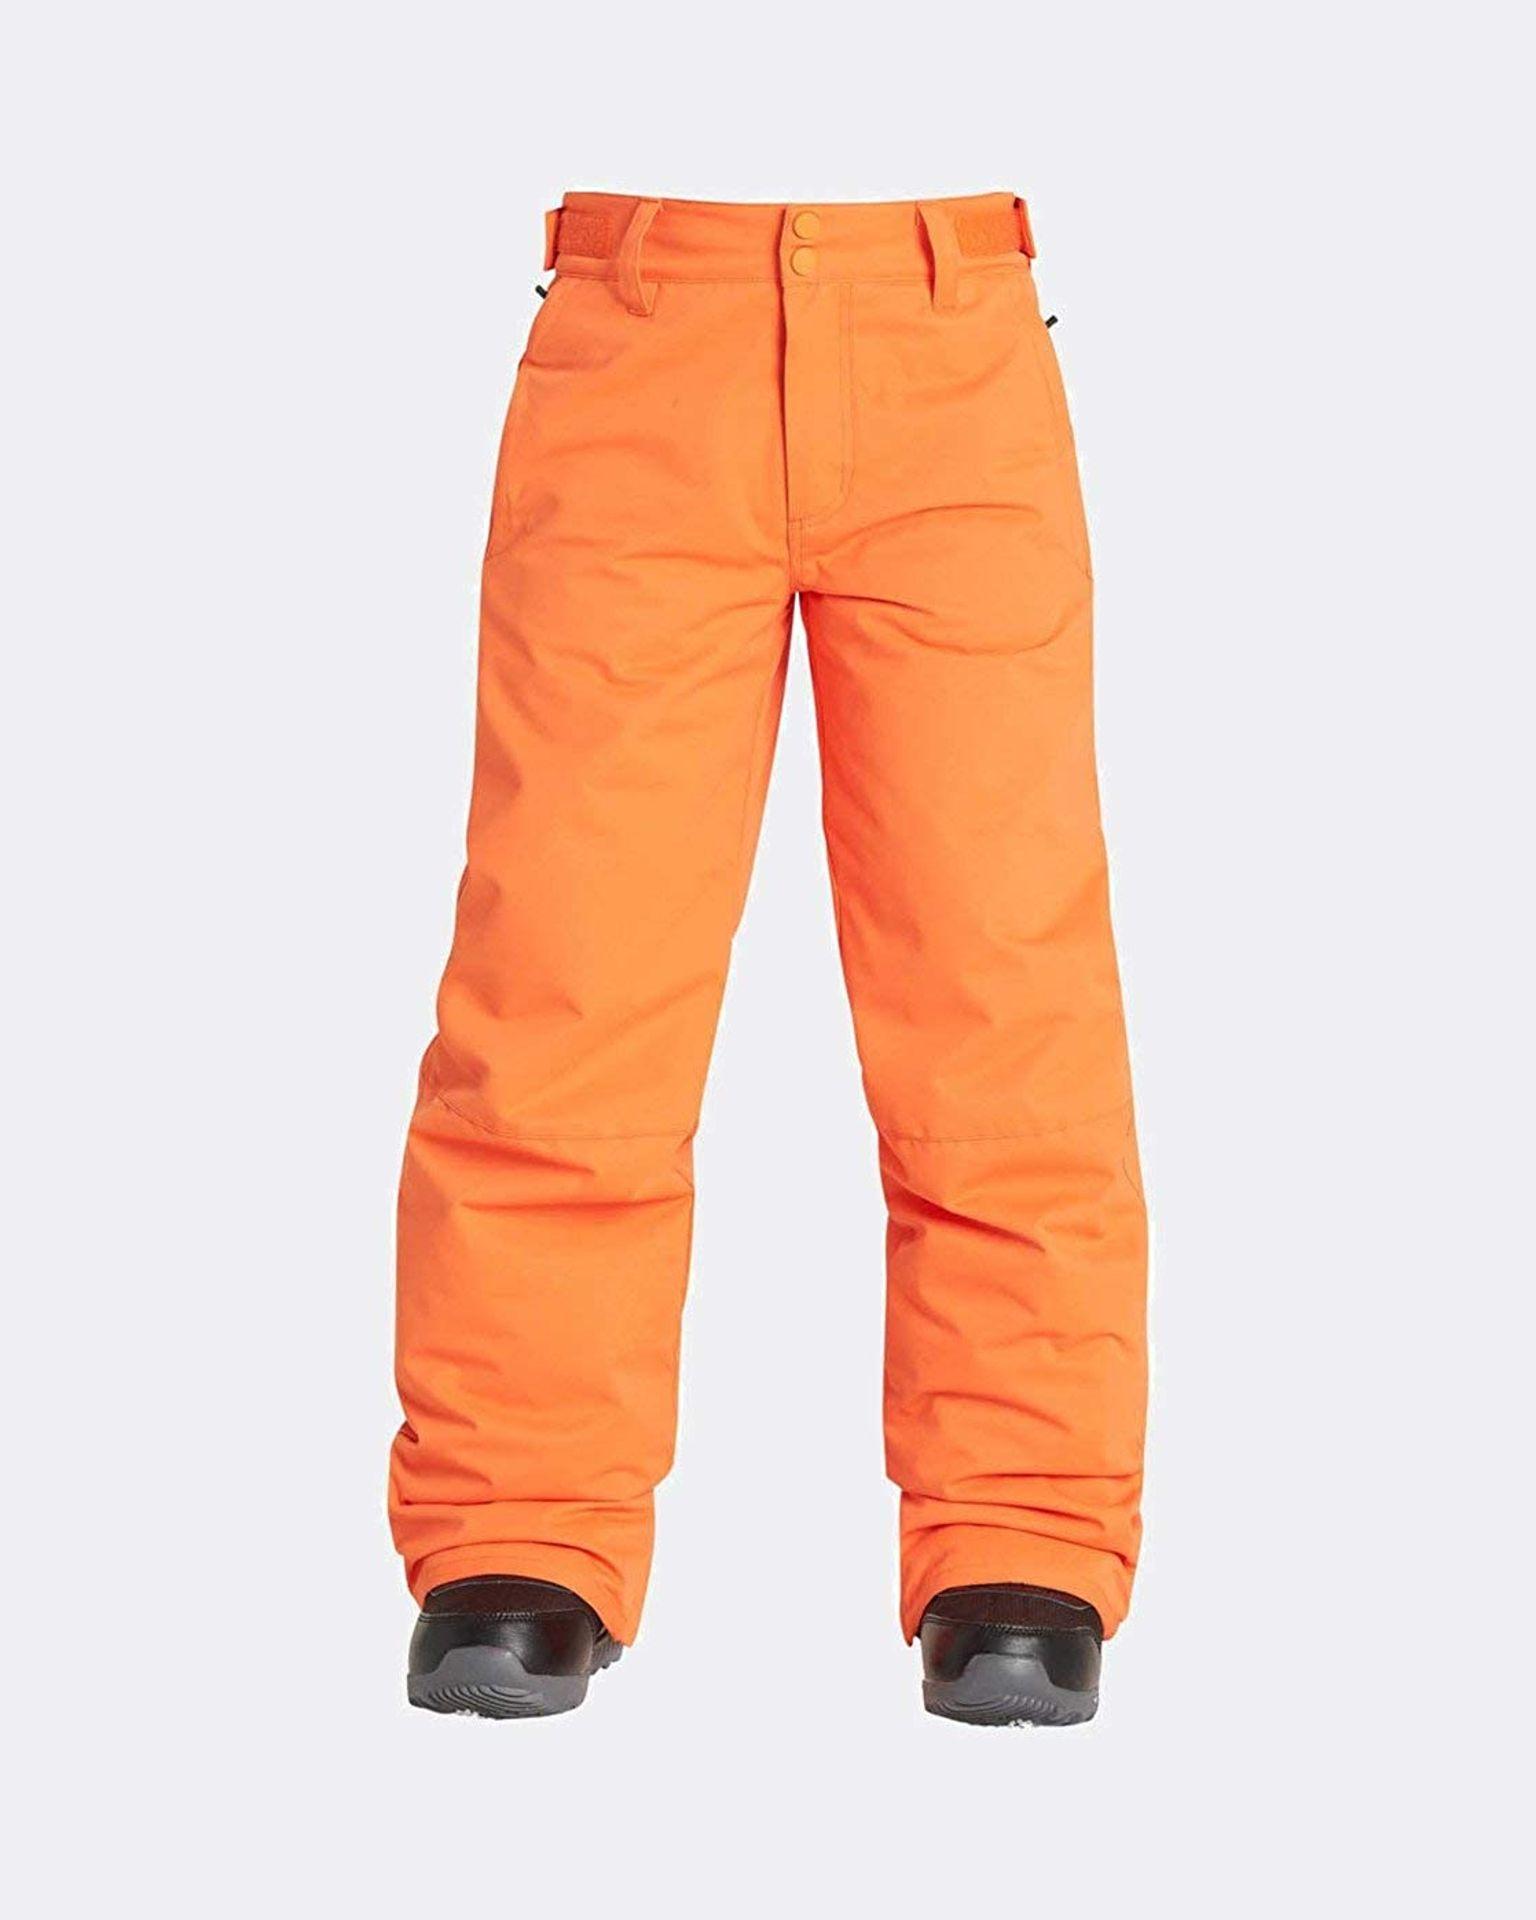 New - Billabong Grom Boy Childrens Ski Pants - Rrp 80.54